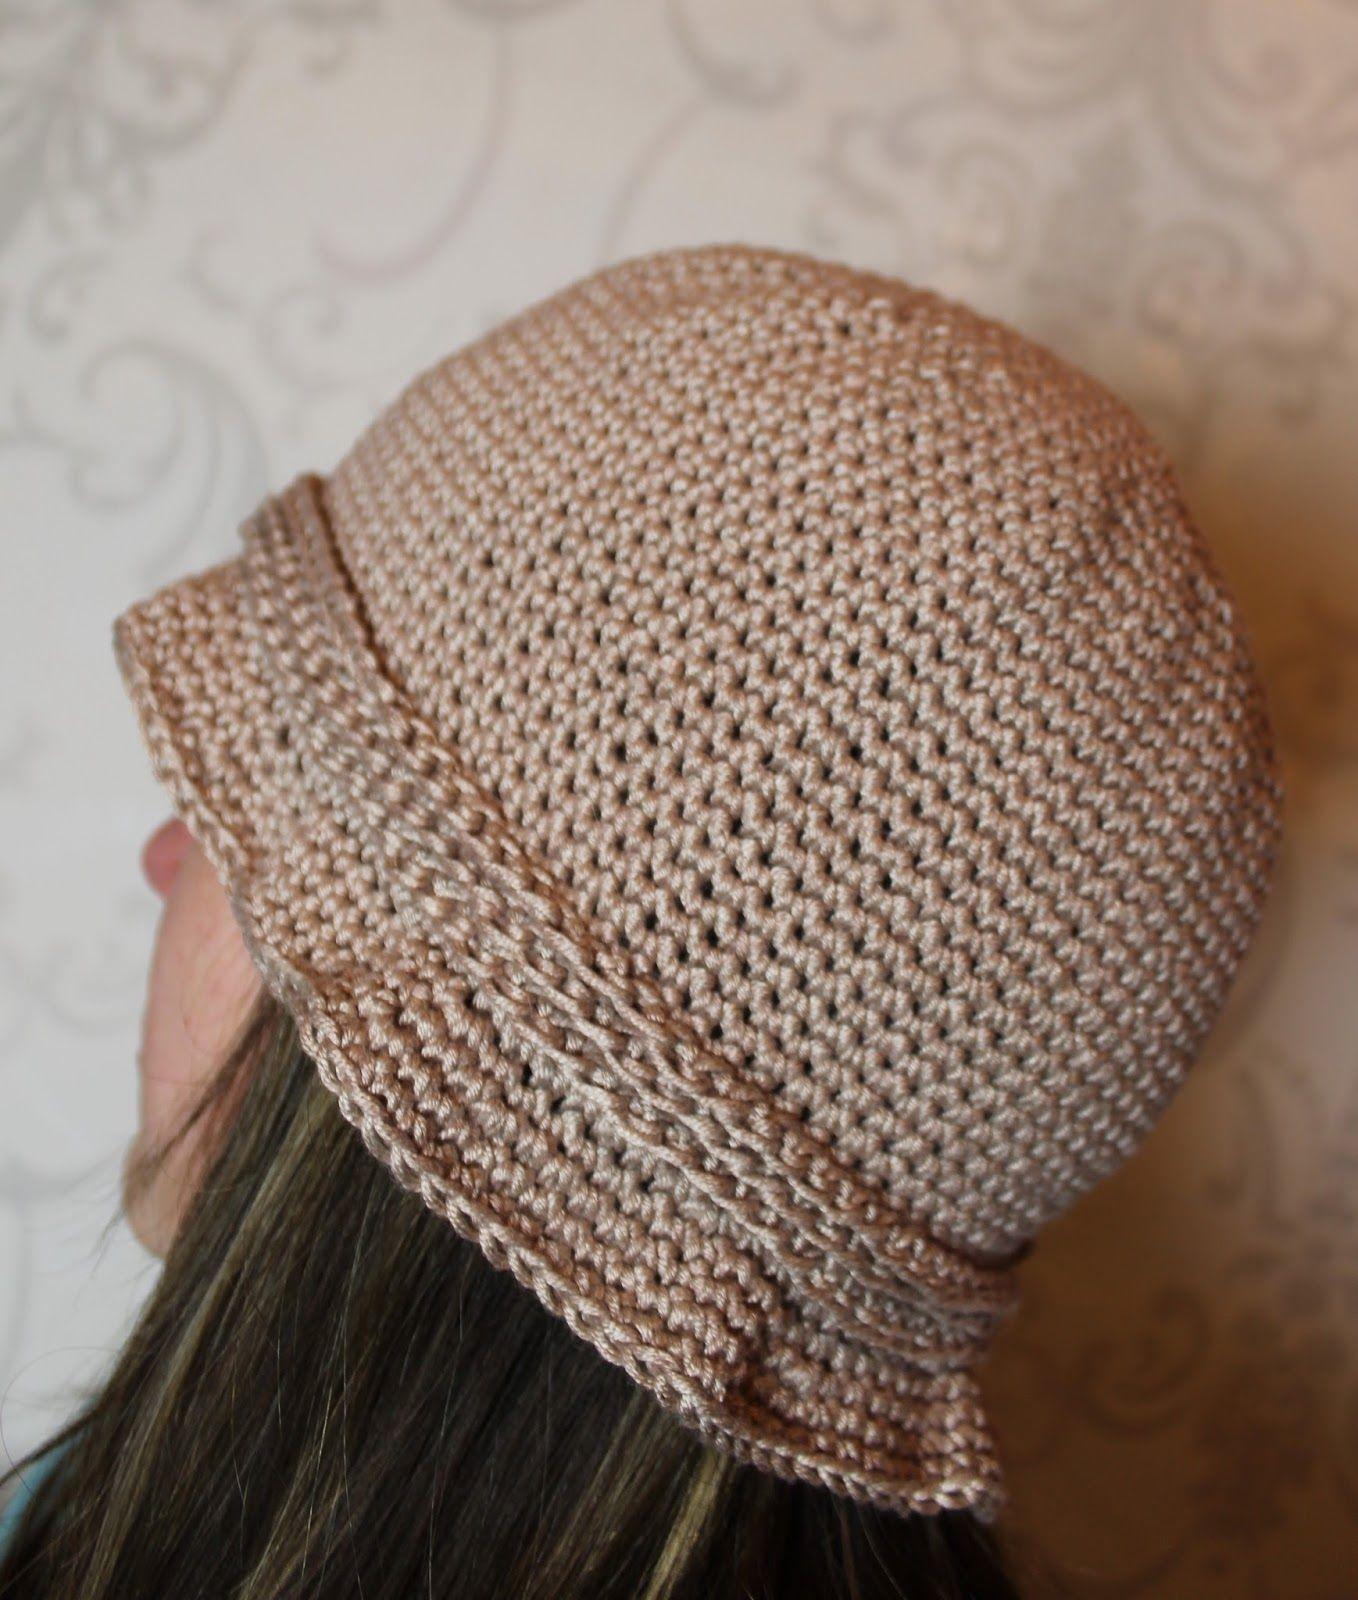 Katri Knits: Virkattu hellehattu *Crocheted summer hat*